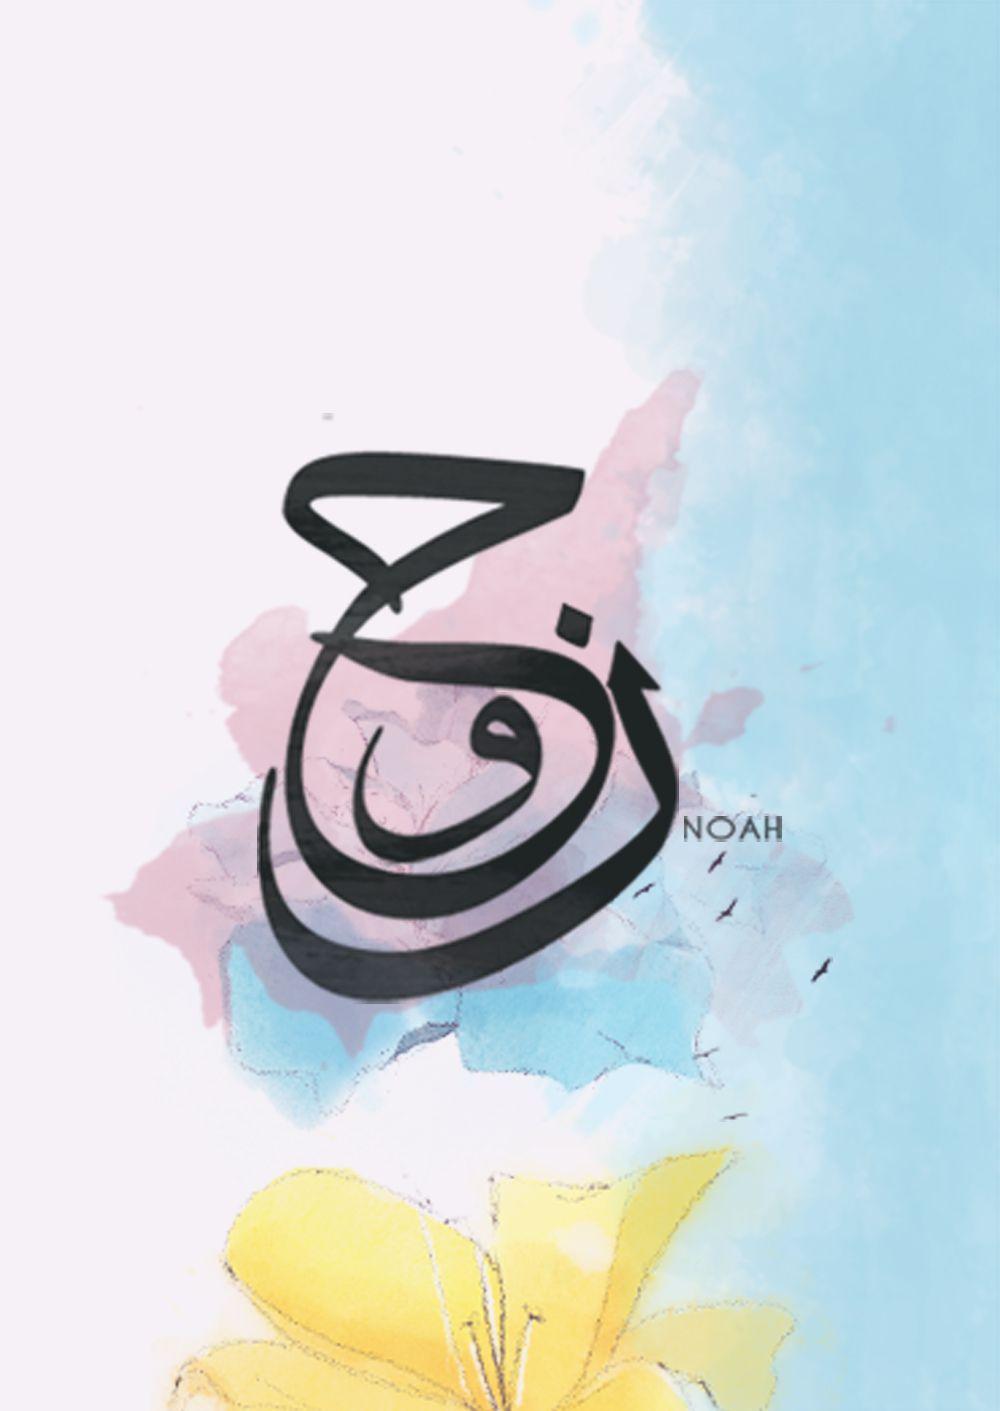 نوح عليه السلام Art Artwork Symbols